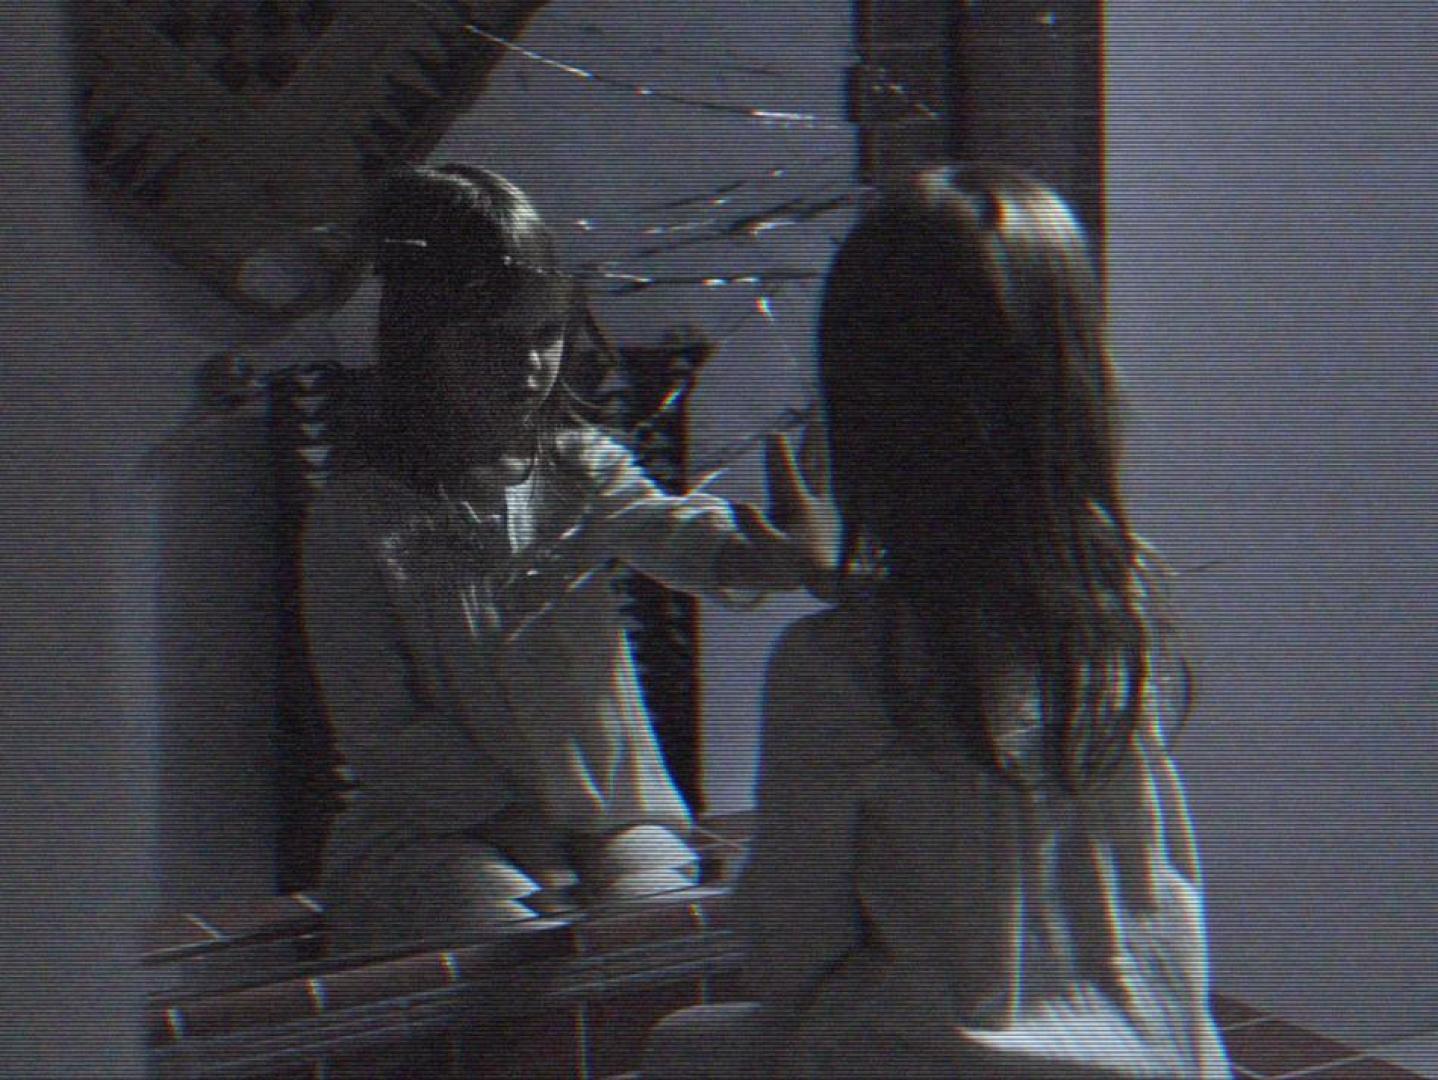 Paranormal Activity: The Ghost Dimension - Parajelenségek: Szellemdimenzió (2015) 1. kép